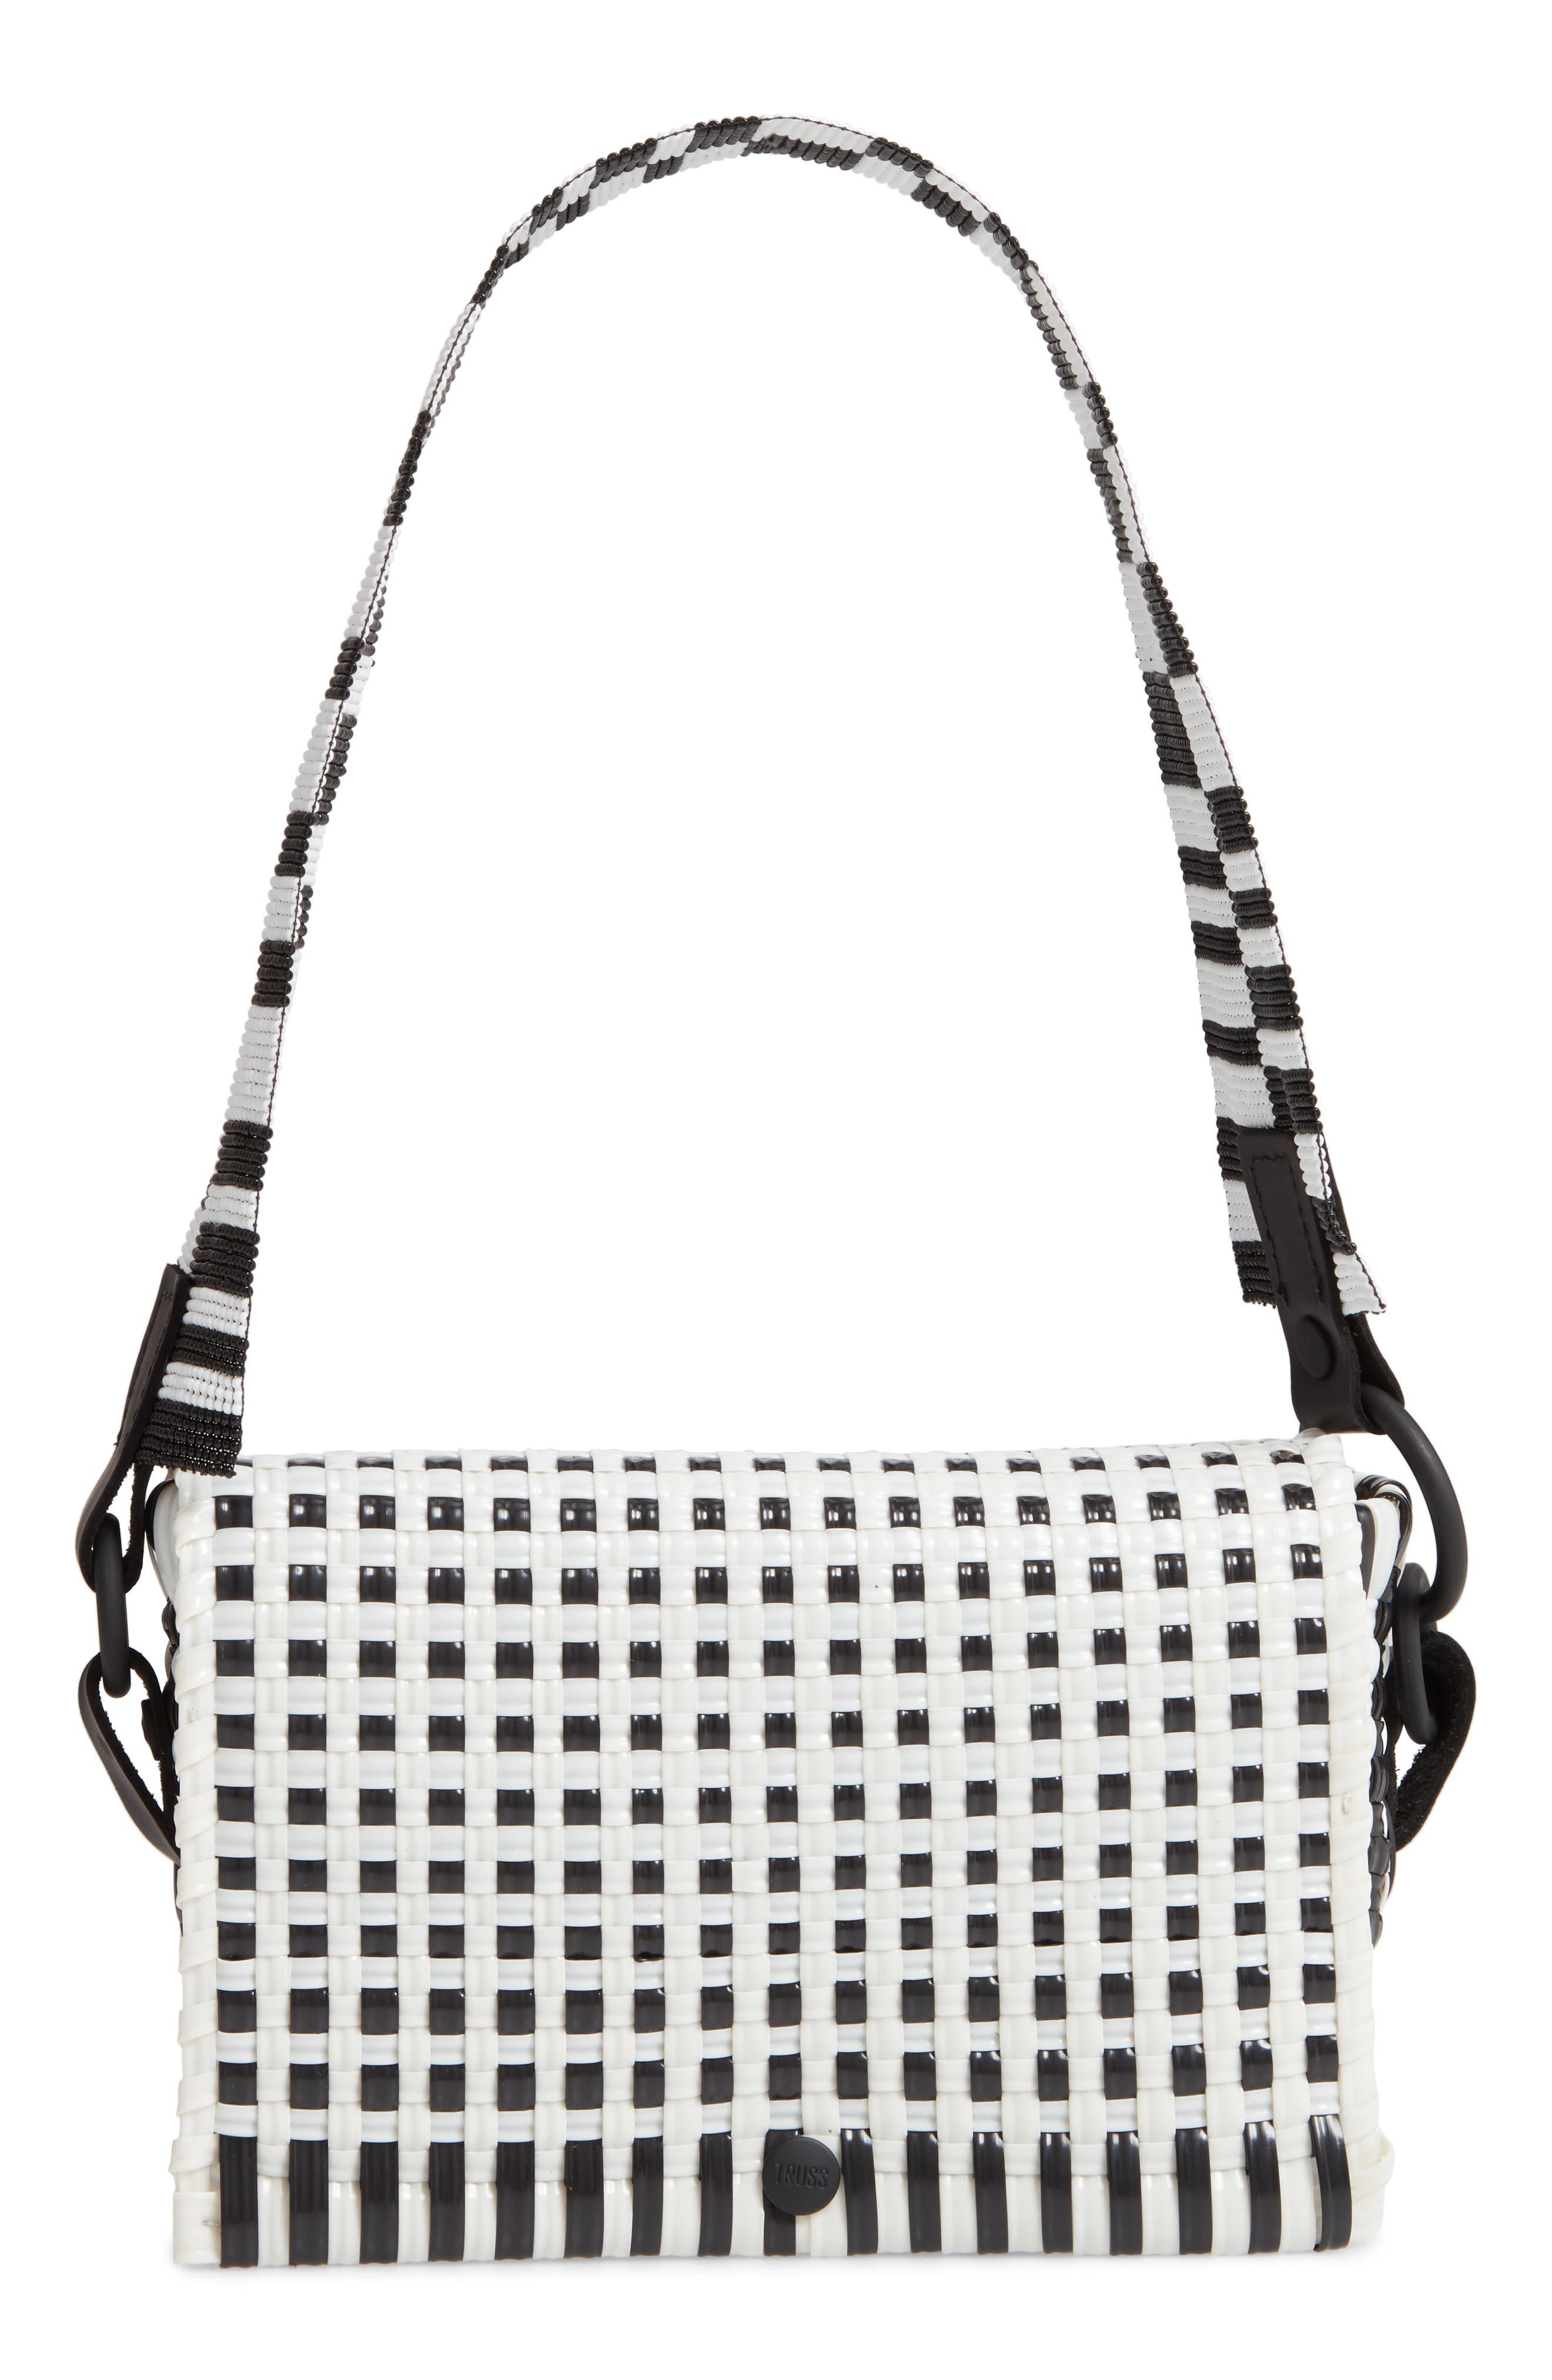 Woven Baguette Shoulder Bag,                         Main,                         color, BLACK/ WHITE